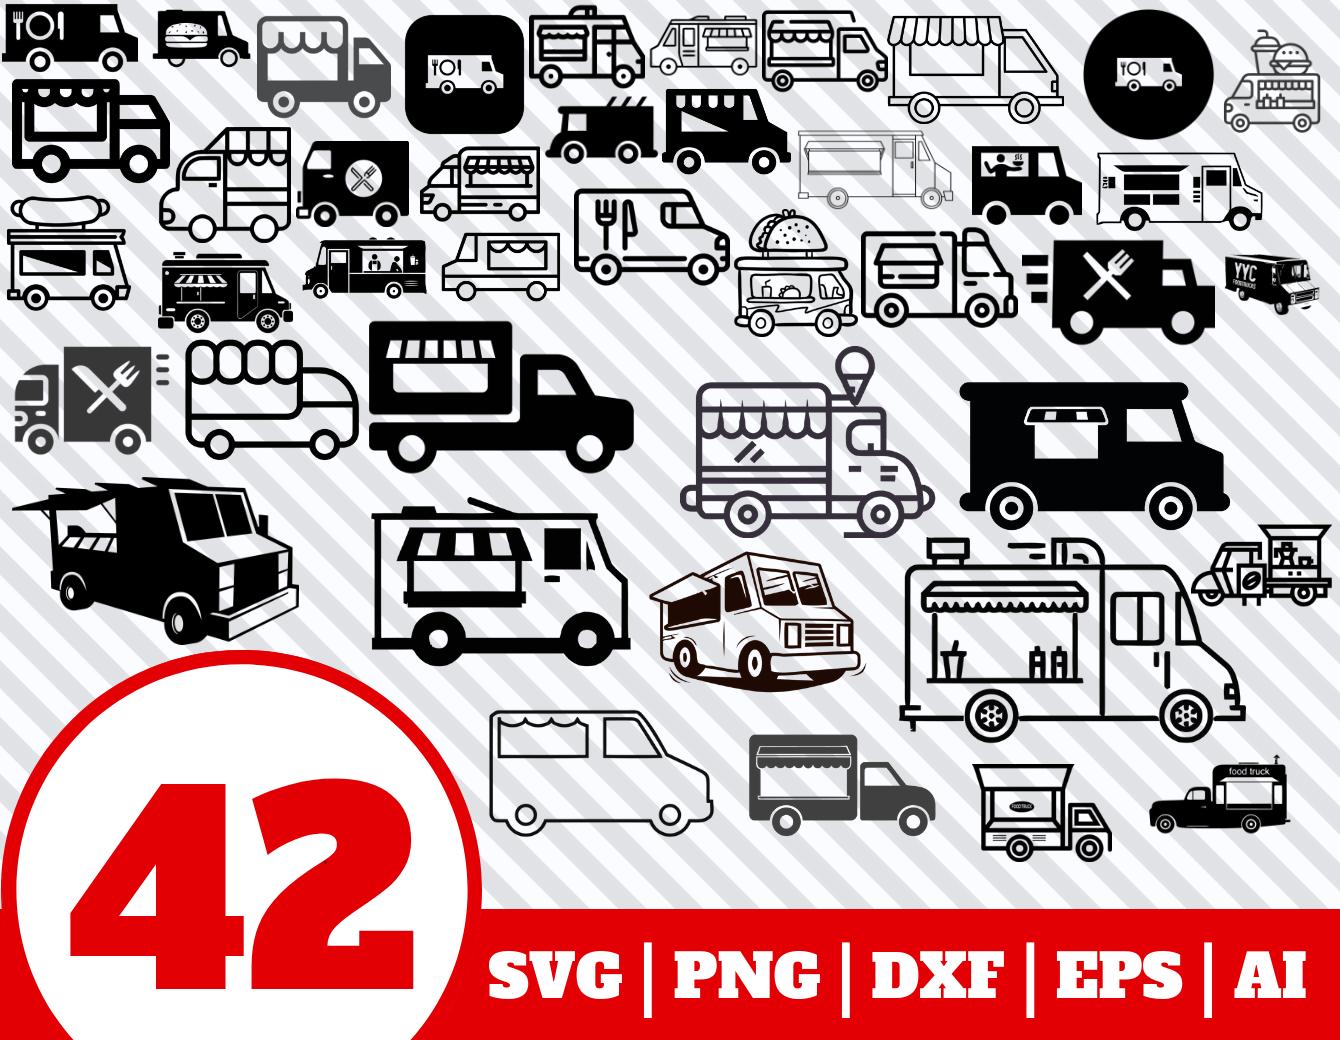 42 Food Truck Svg Bundle Food Truck Clipart Food Truck Vector By Sanfran Thehungryjpeg Com Truck Aff Svg F Graphic Design Art Clip Art Illustrators